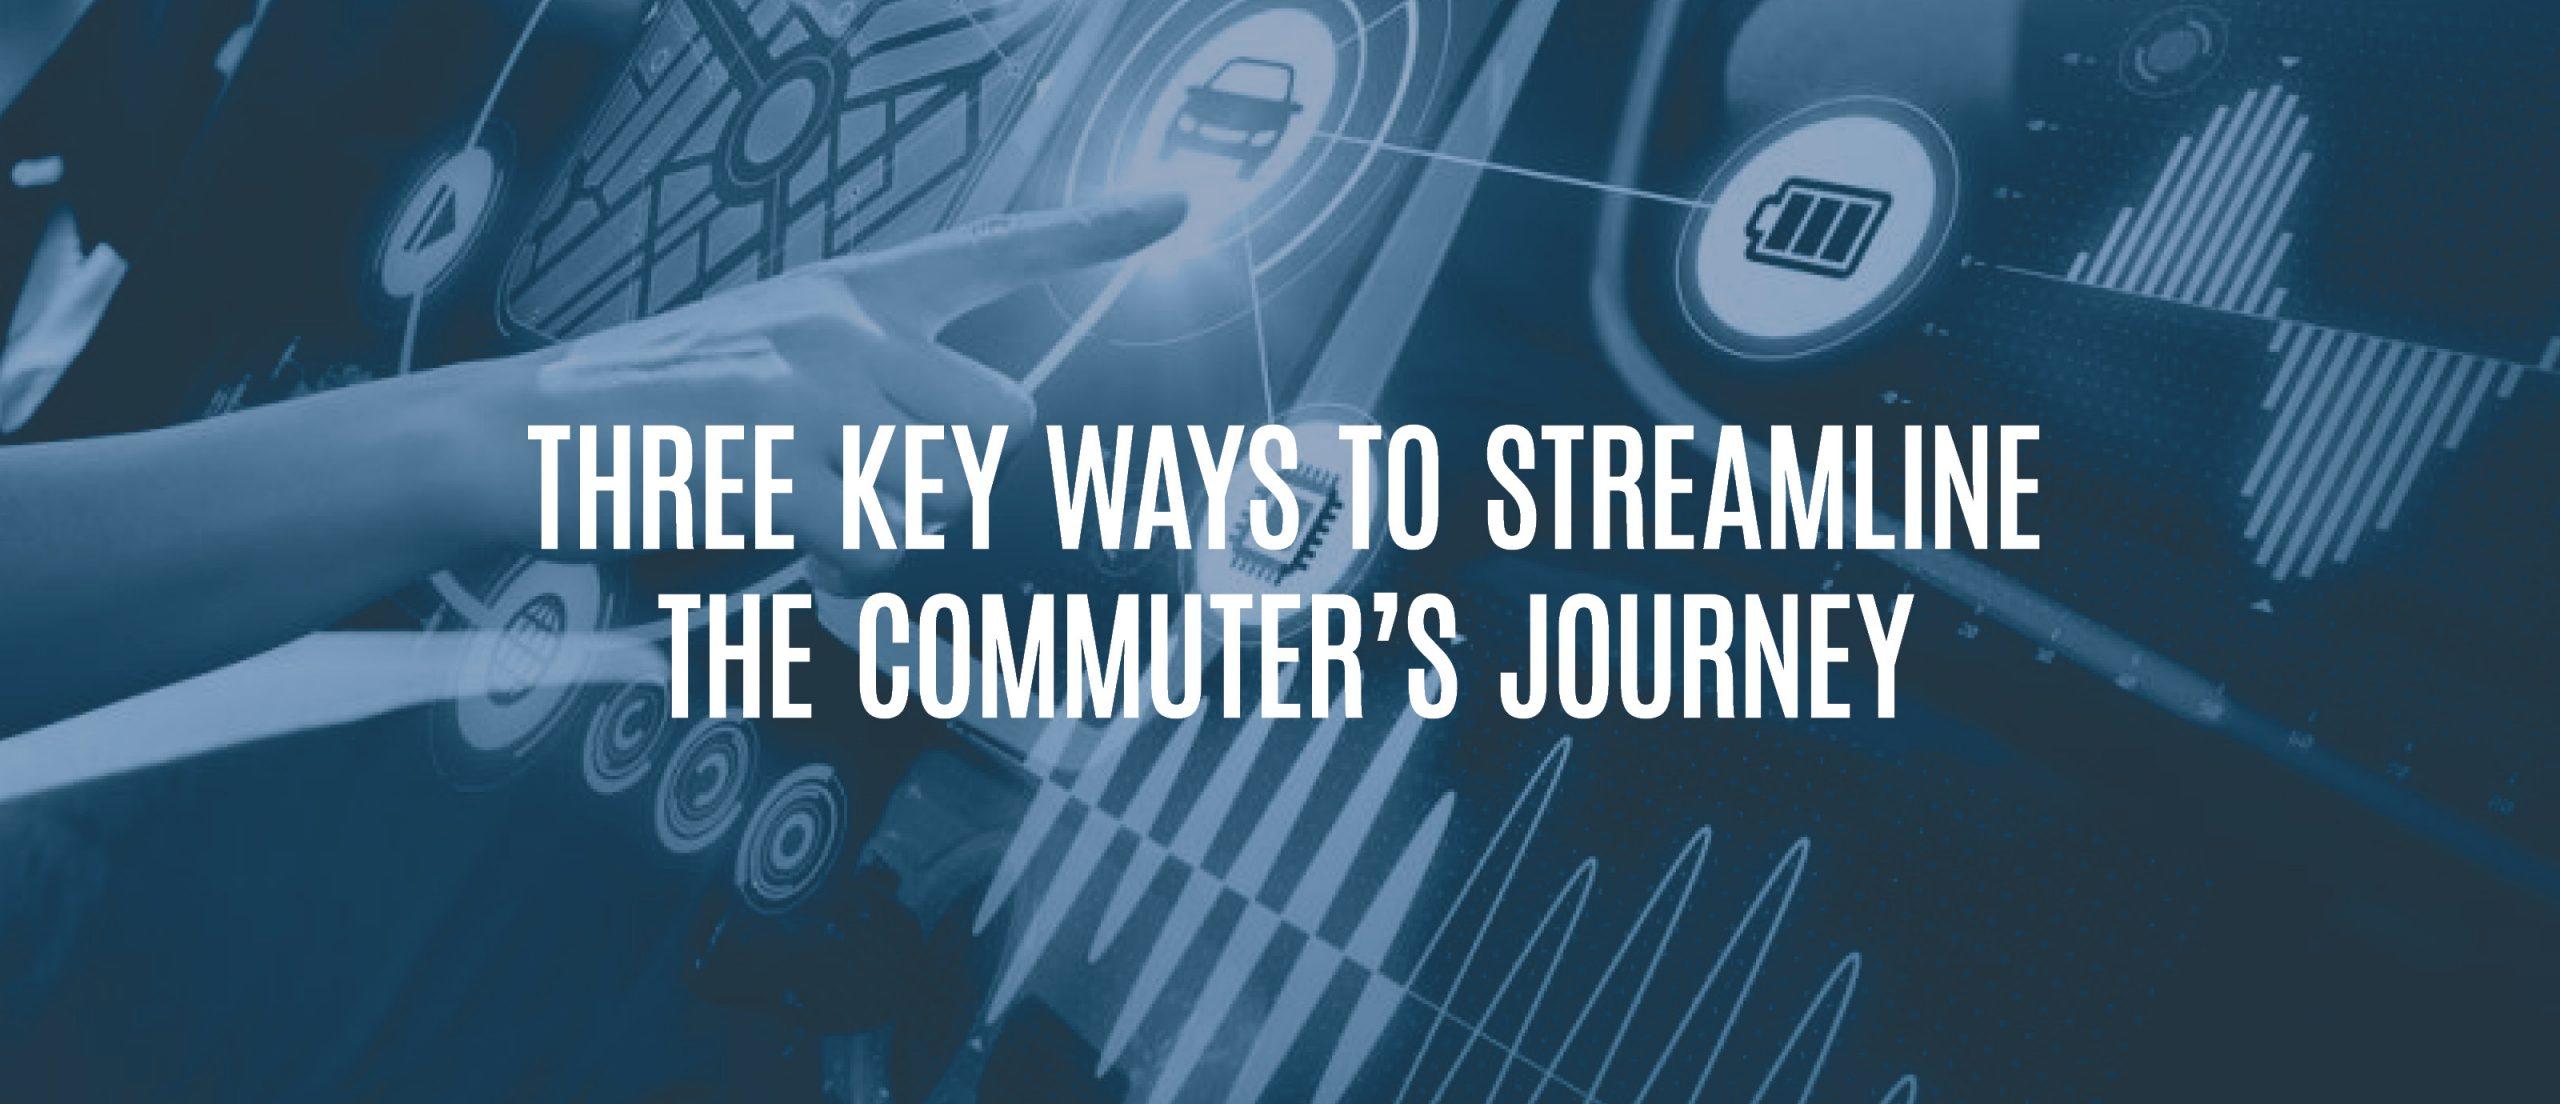 Blog Title - Three key ways to streamline the commuter's journey